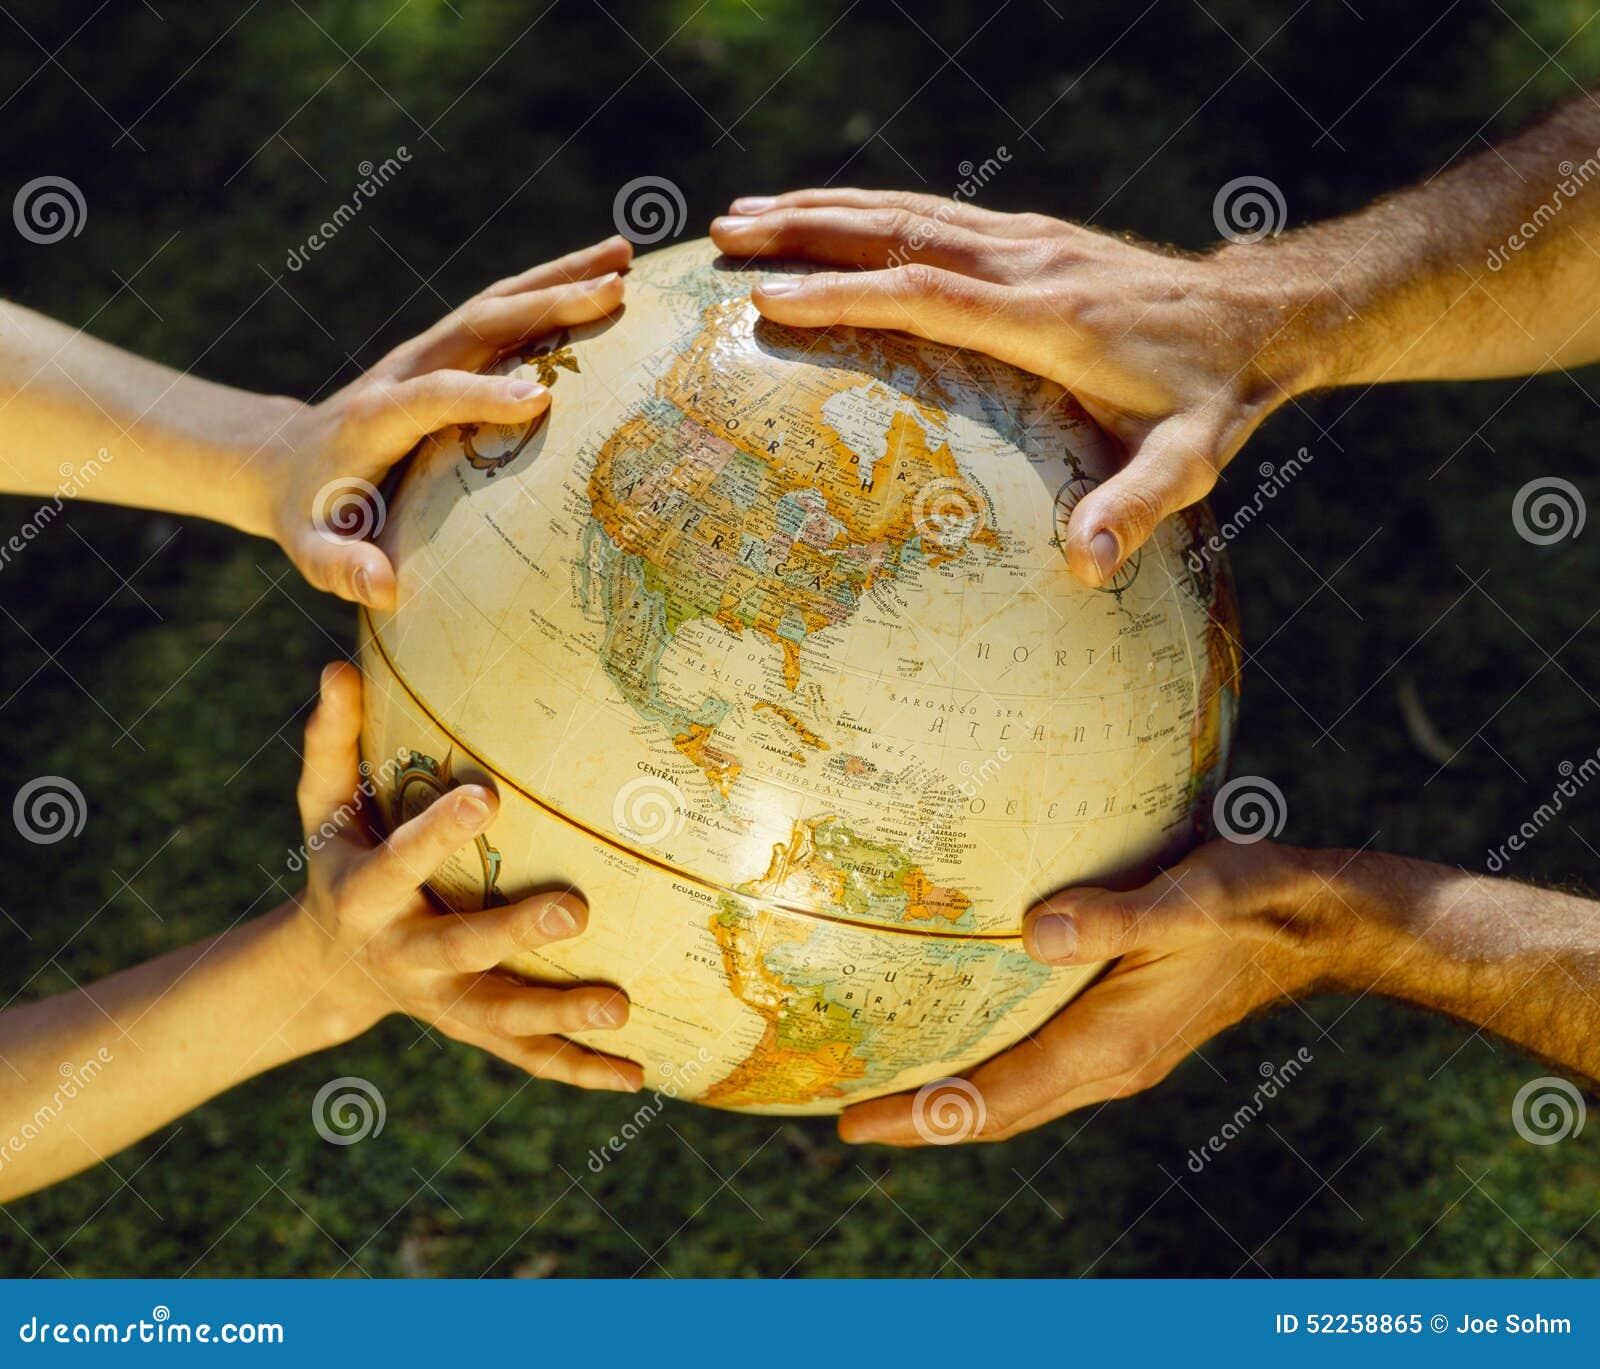 Globe in hands, environmental care